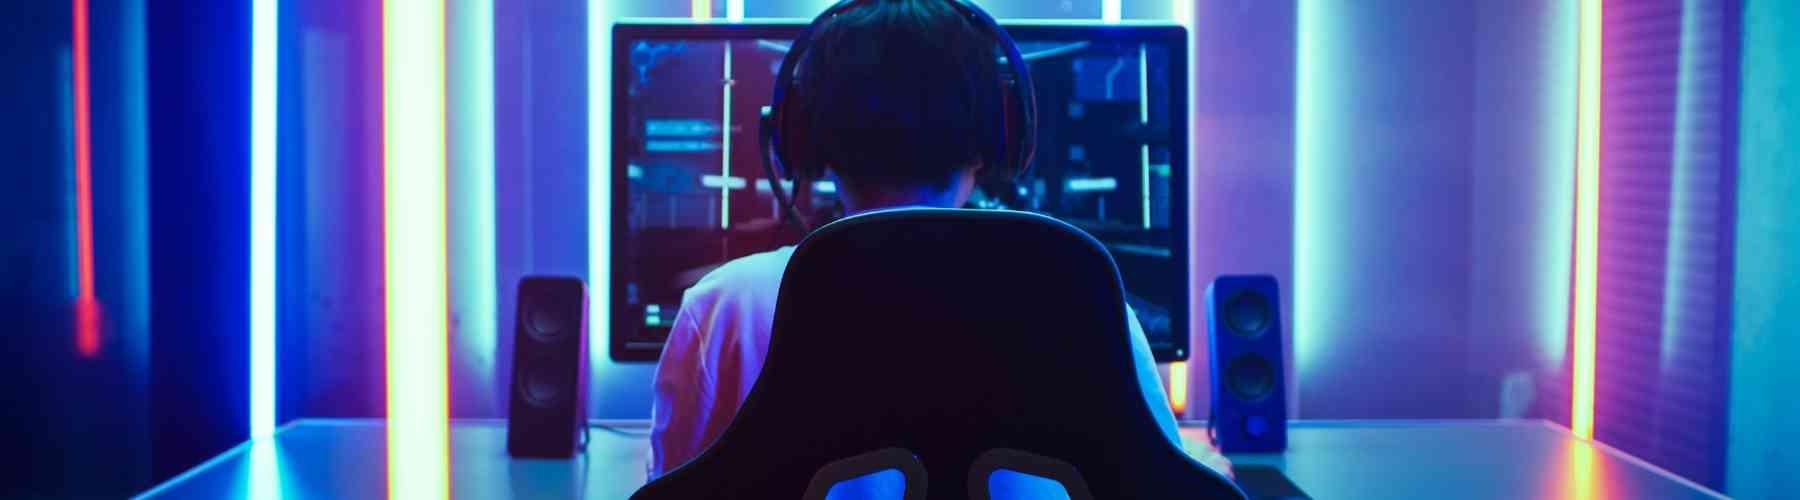 Stream Video Games